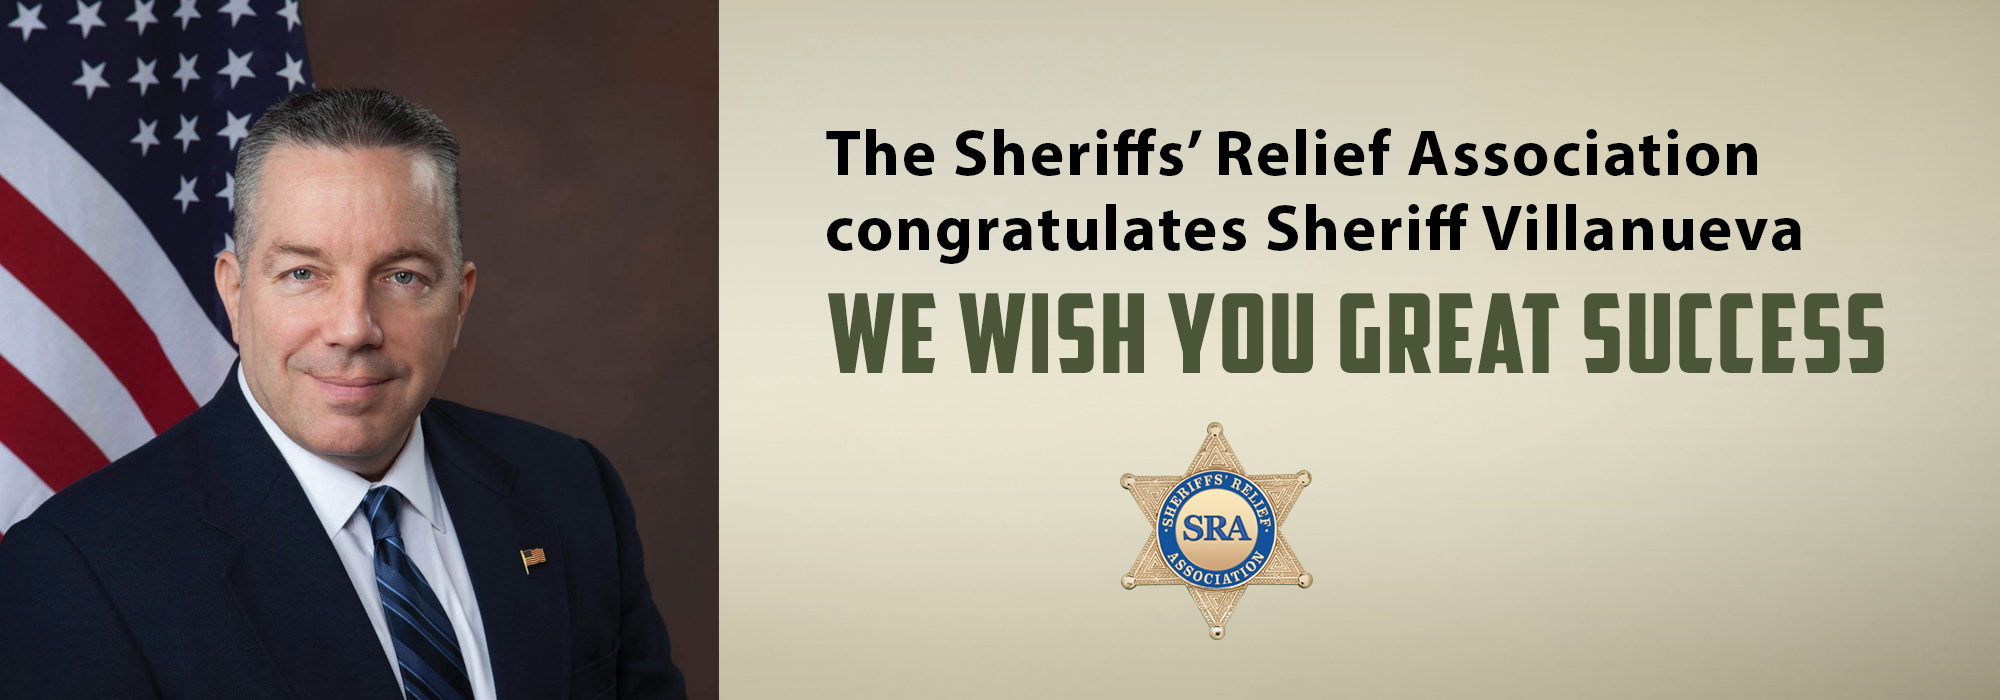 Welcoming-New-Sheriff-Nov18-Slider-02